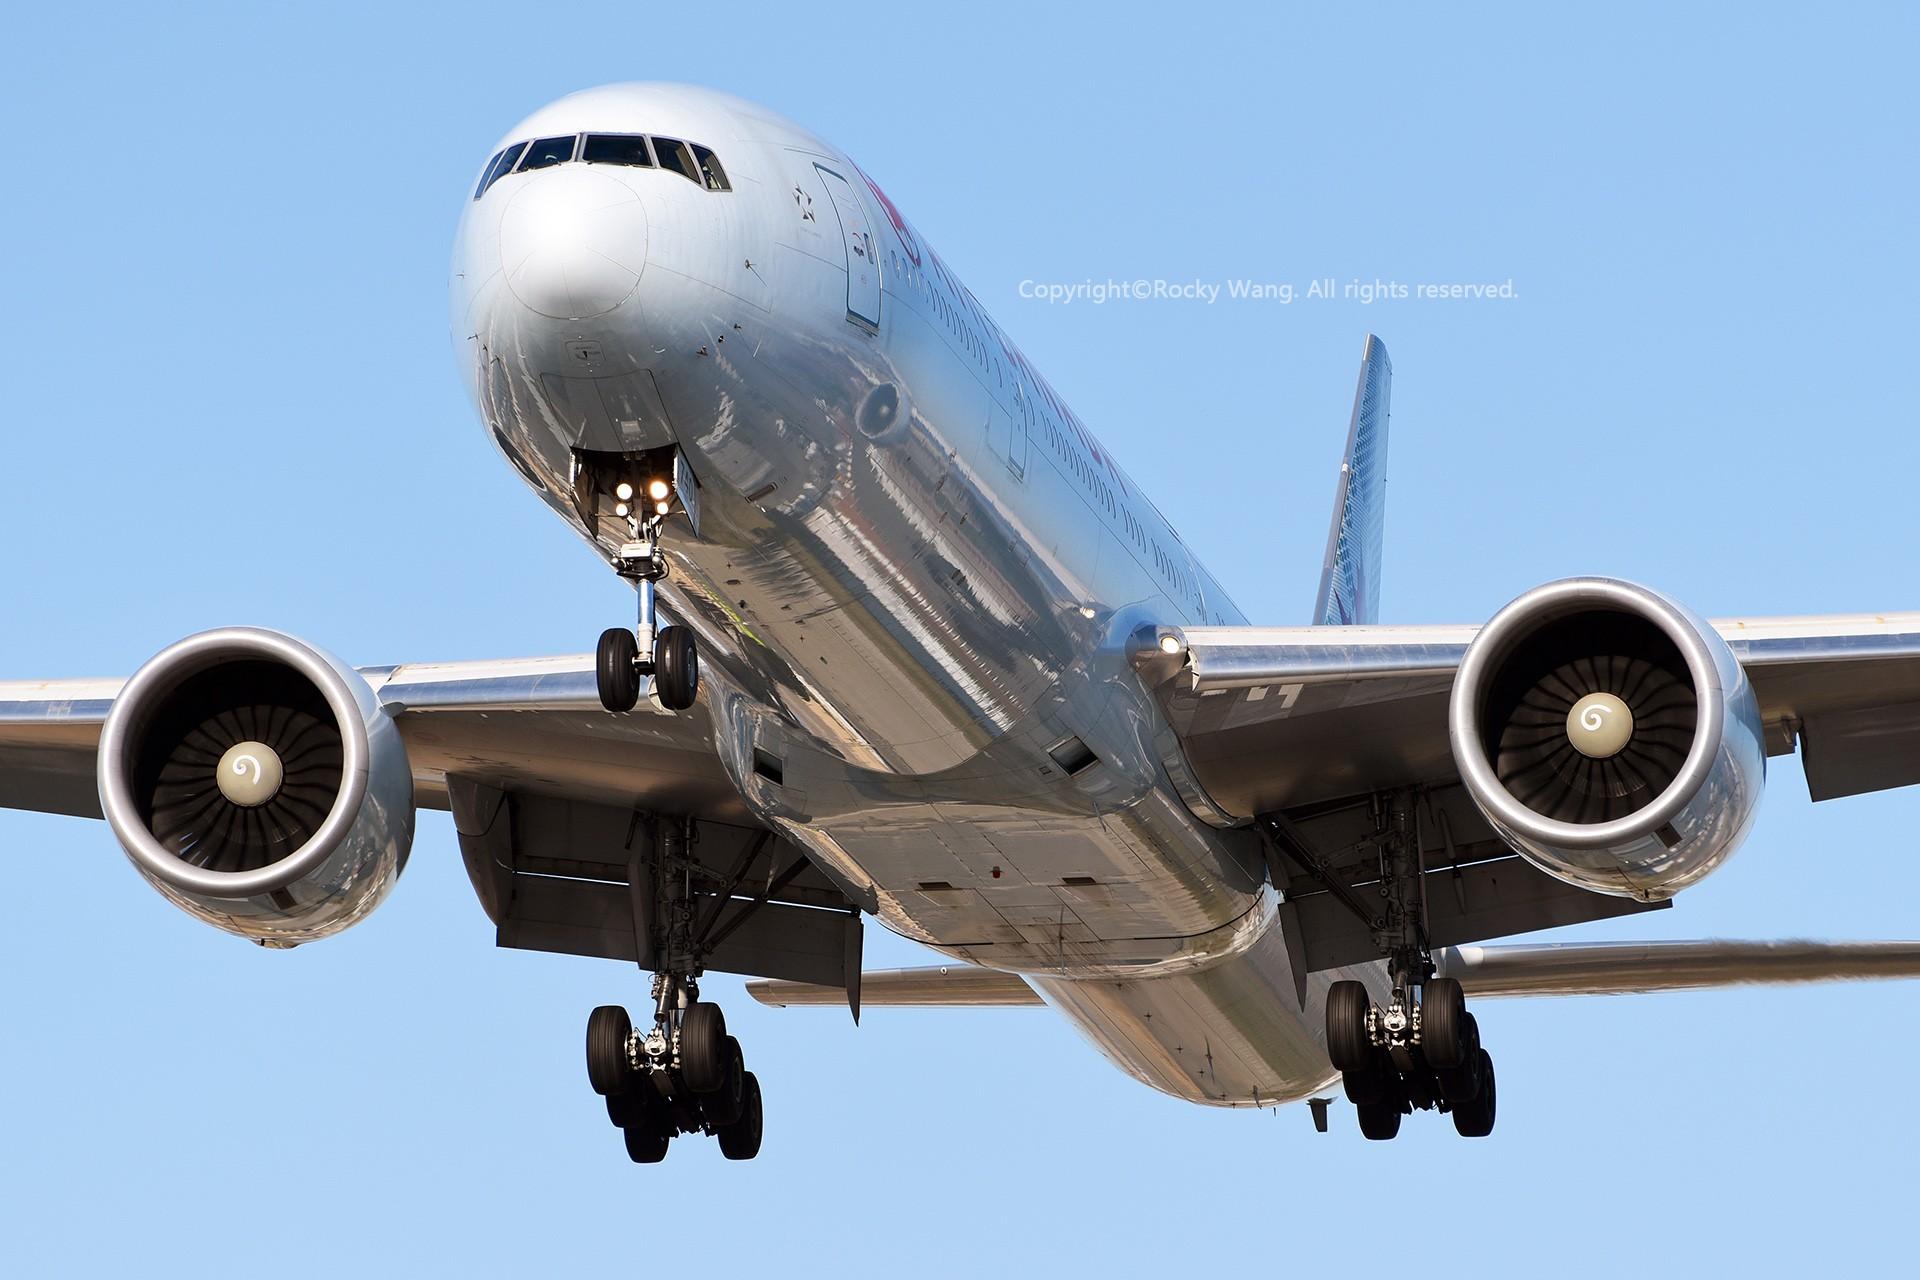 Re:[原创]CYYZ 30图 BOEING 777-333ER C-FIVQ Toronto Lester B. Pearson Int'l Airport